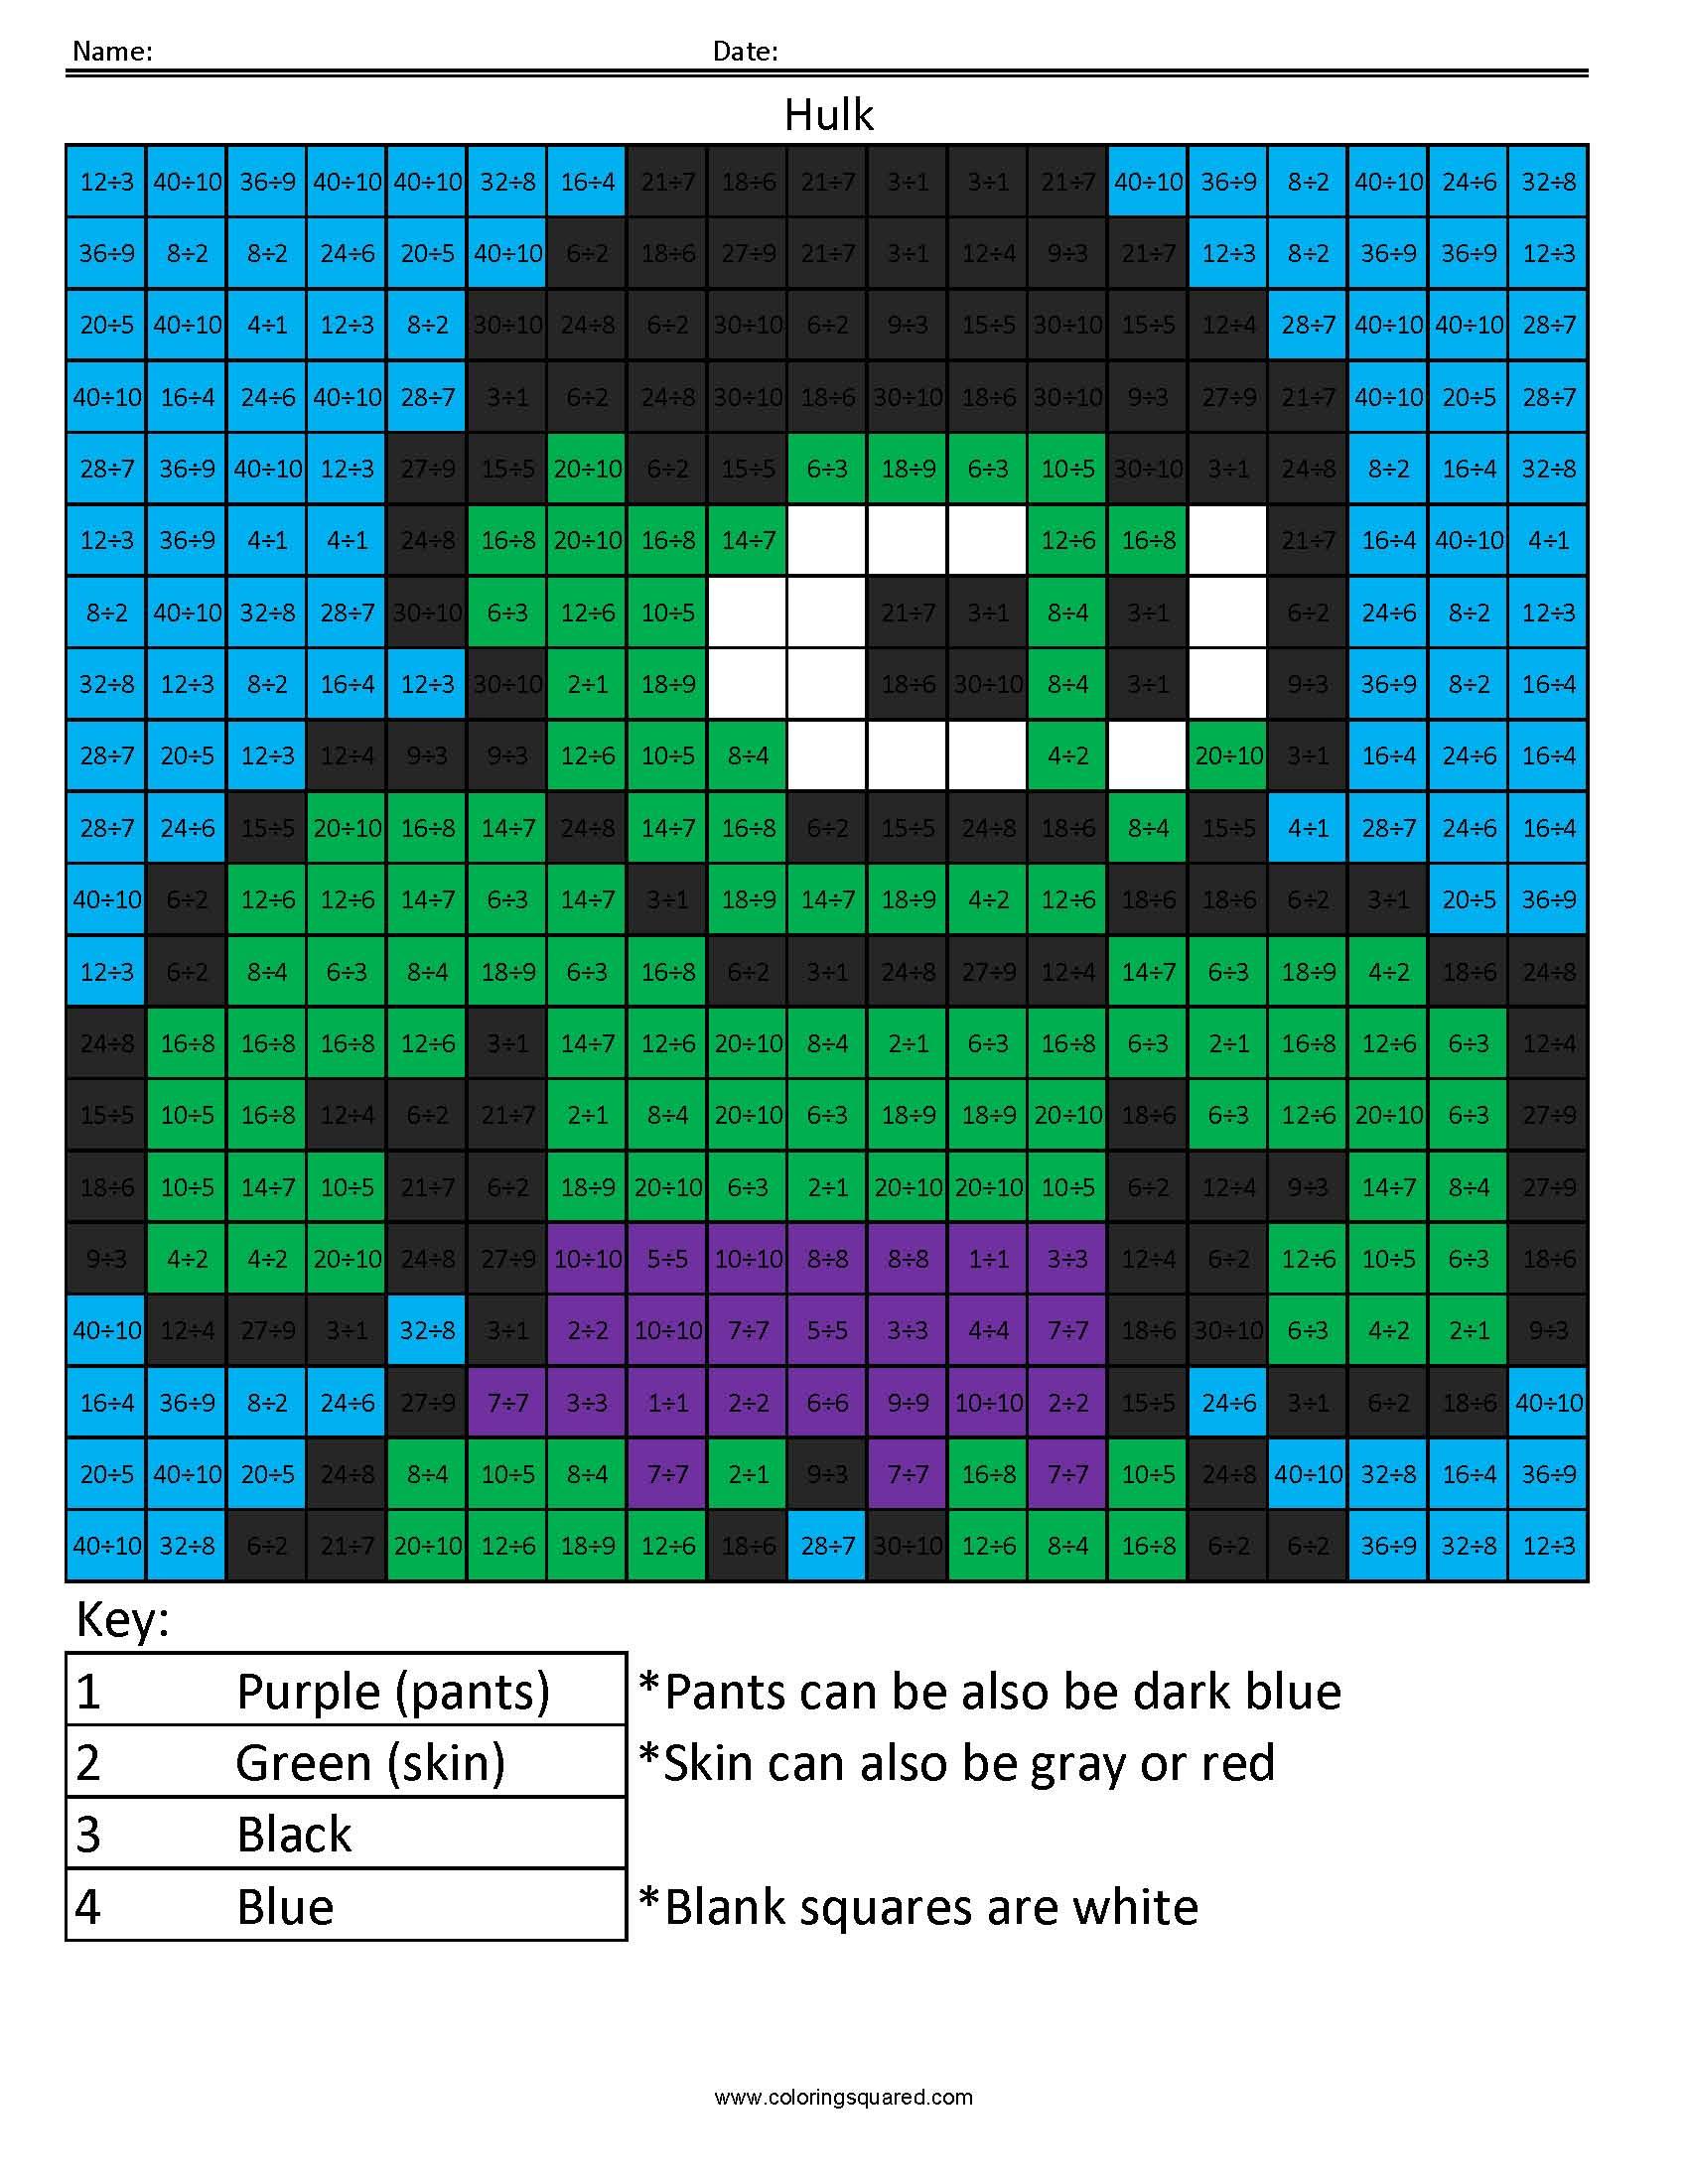 Hulk Basic Division Coloring Squared